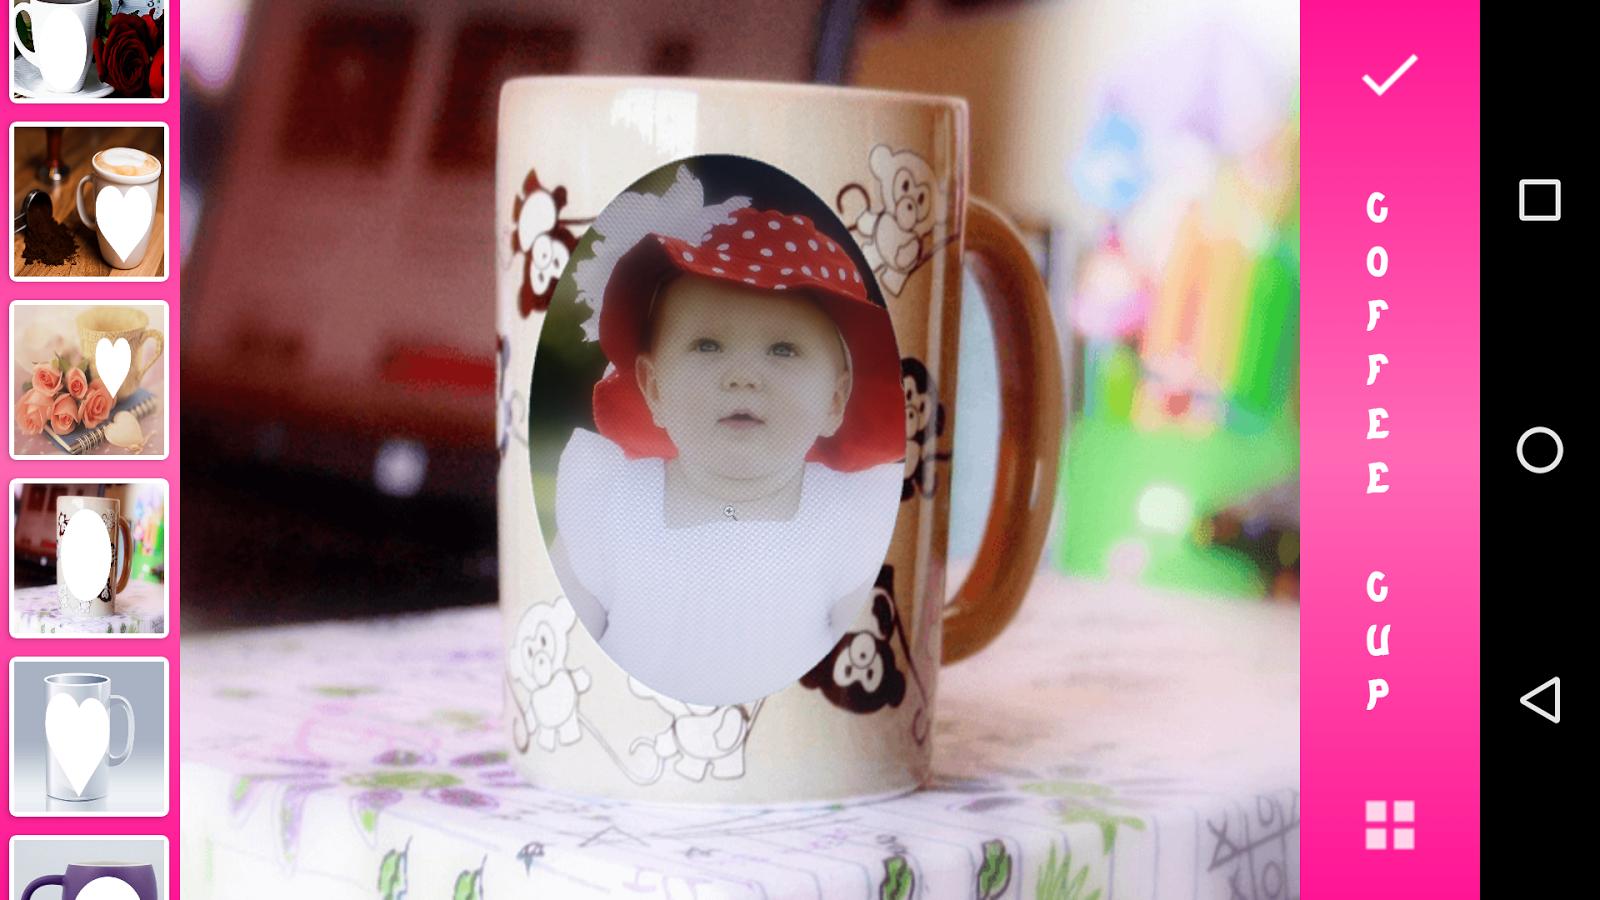 Coffee cup frames -  Coffee Cup Frames 1 0 Screenshot 3